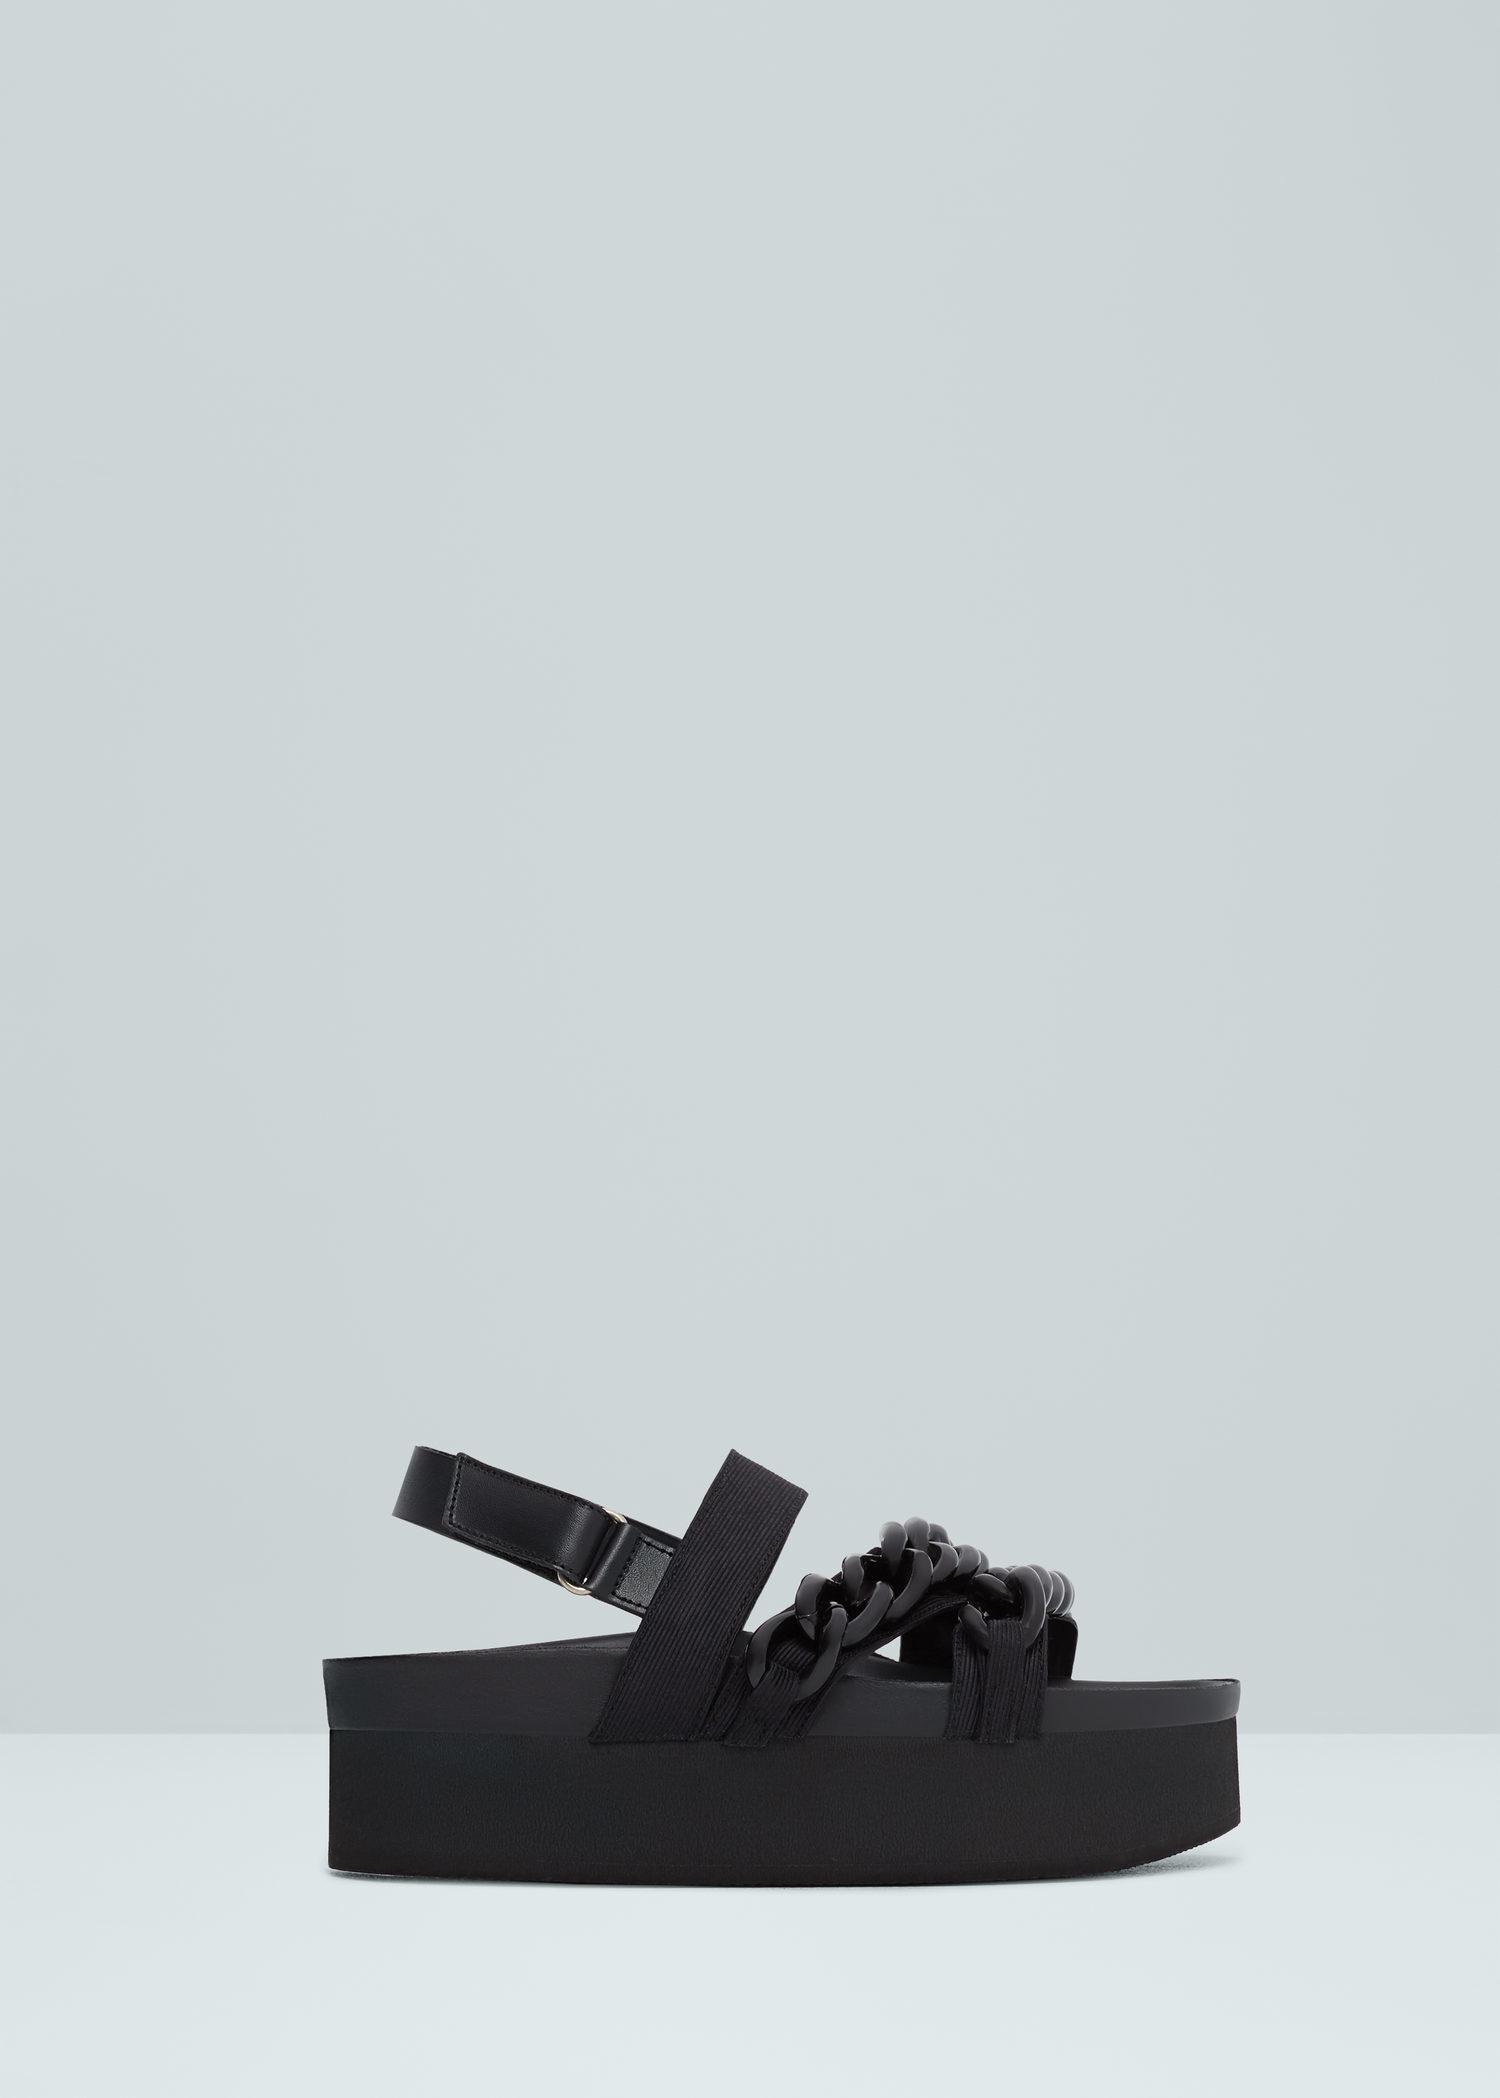 169362a8db Mango Chain Platform Sandals in Black - Lyst